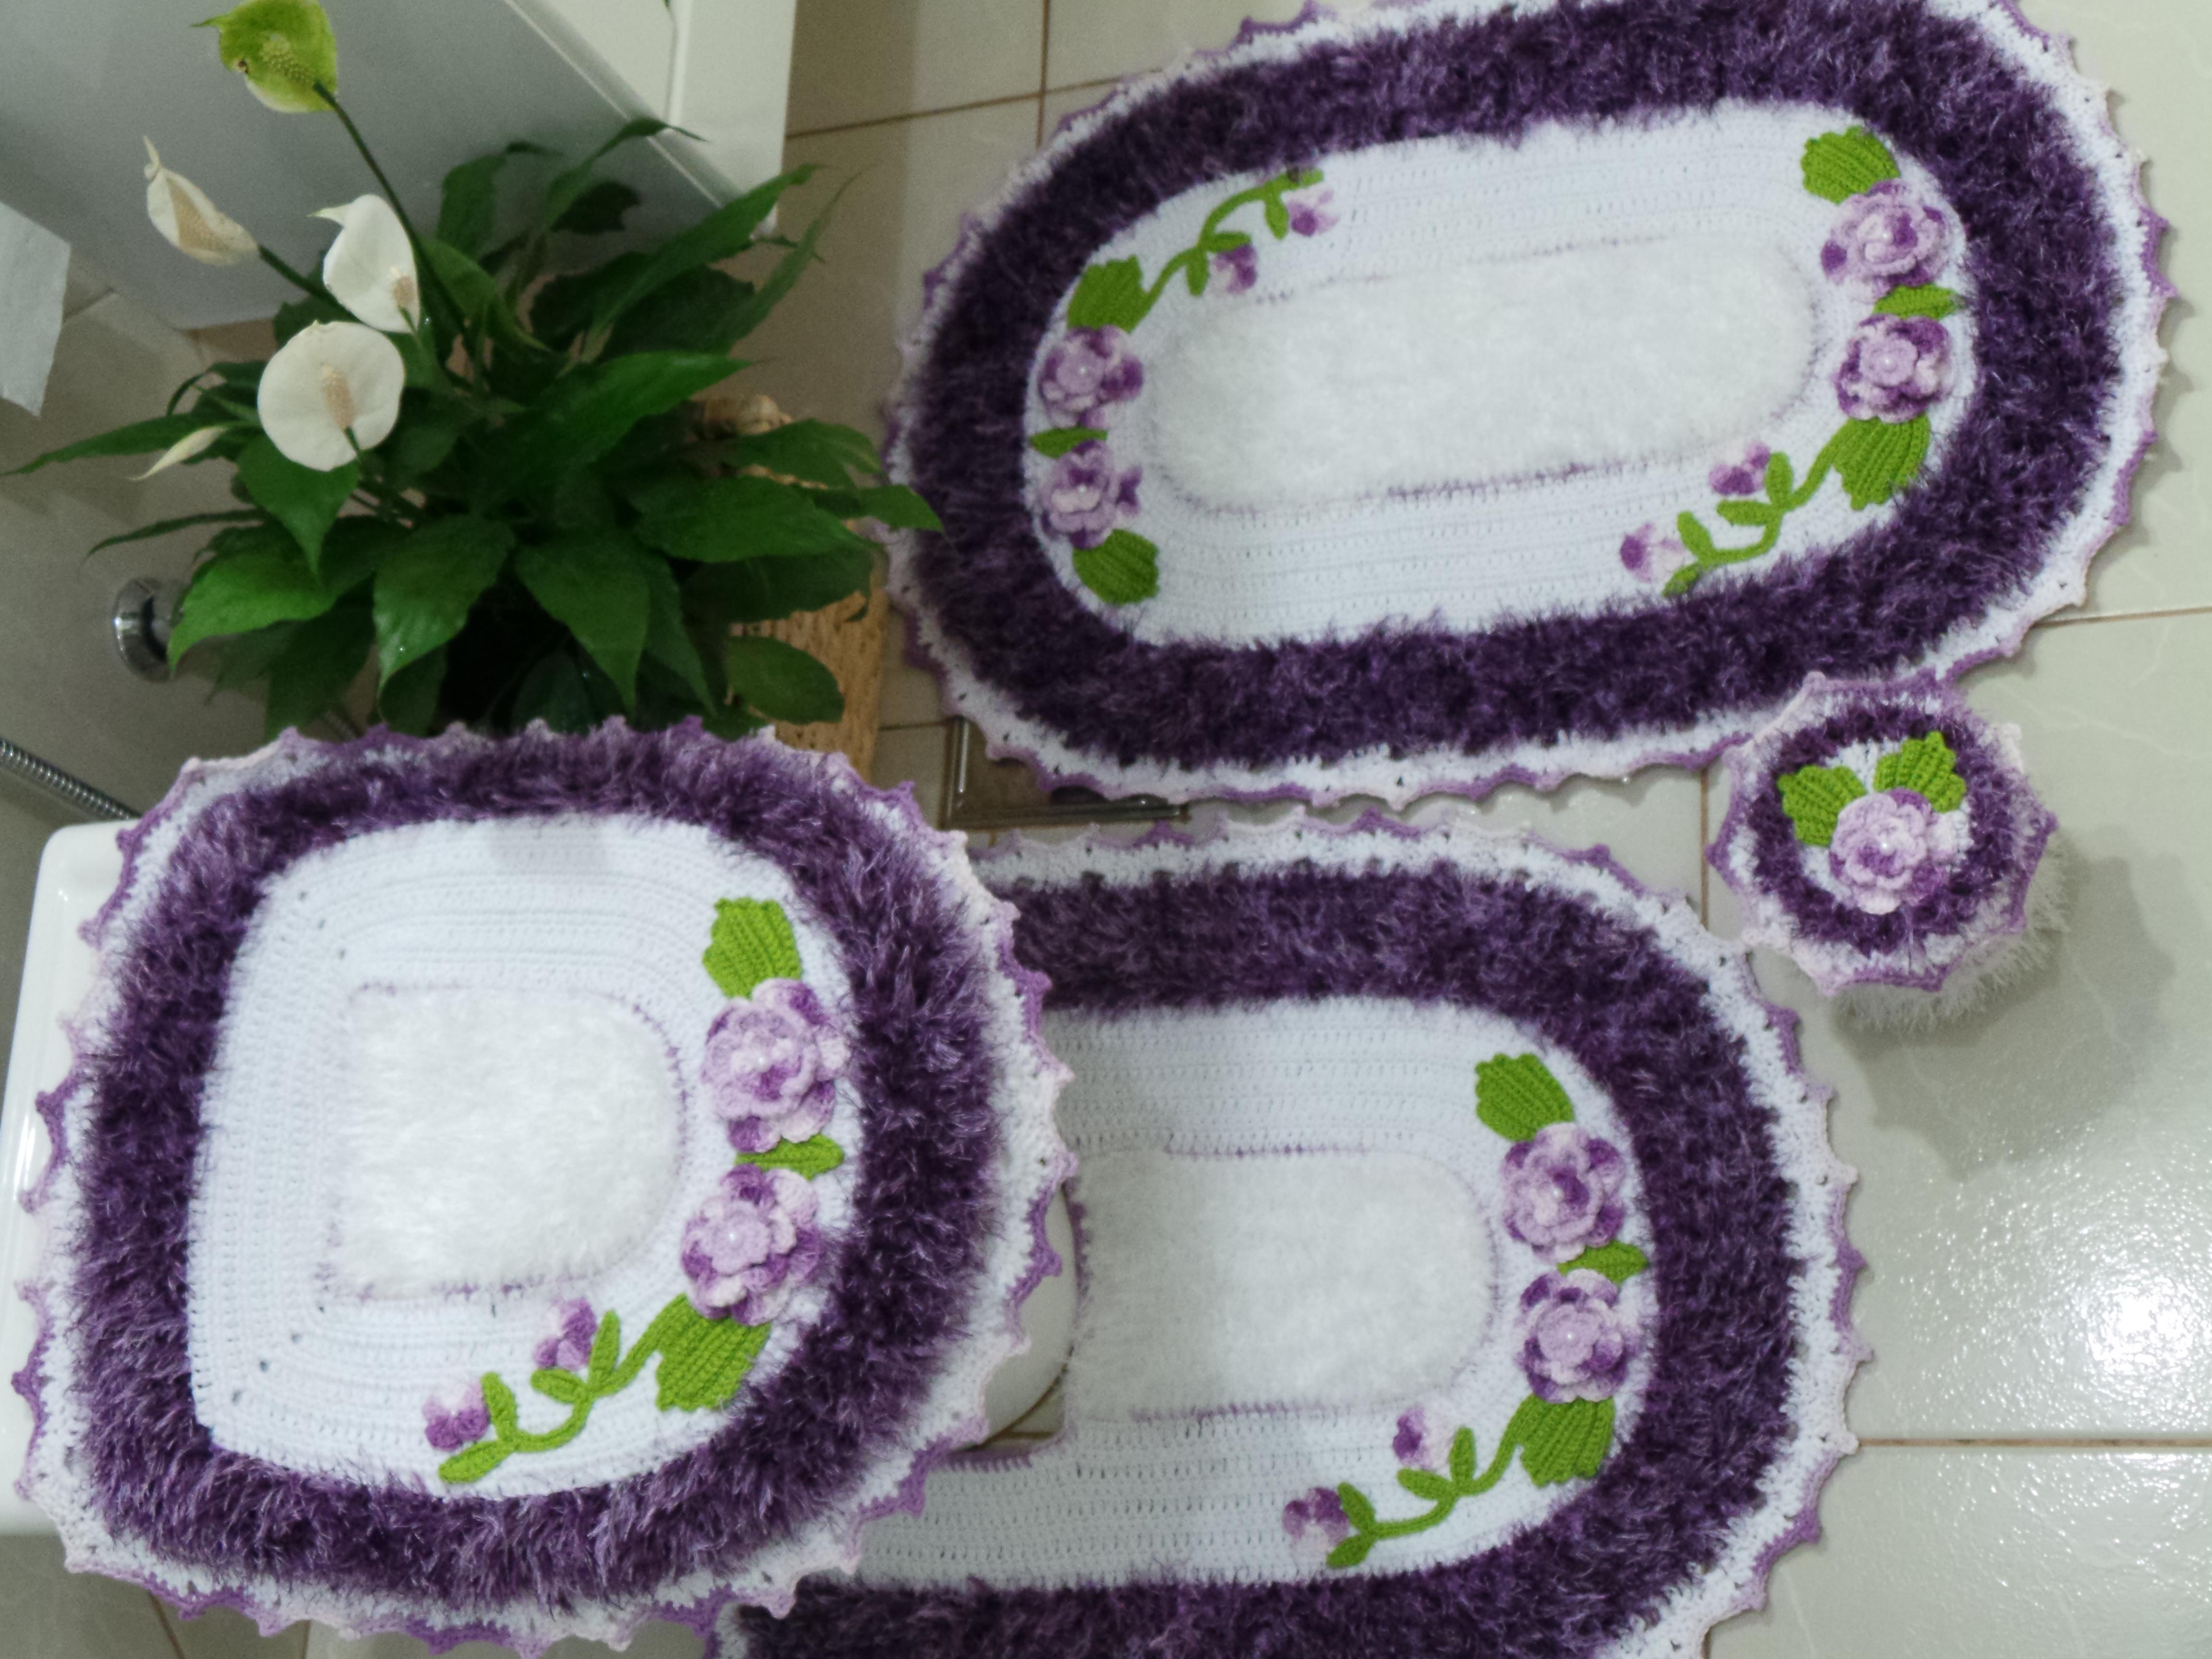 Tapete para banheiro roxo : Jogo tapete maravilha roxo e branco bya bordados elo